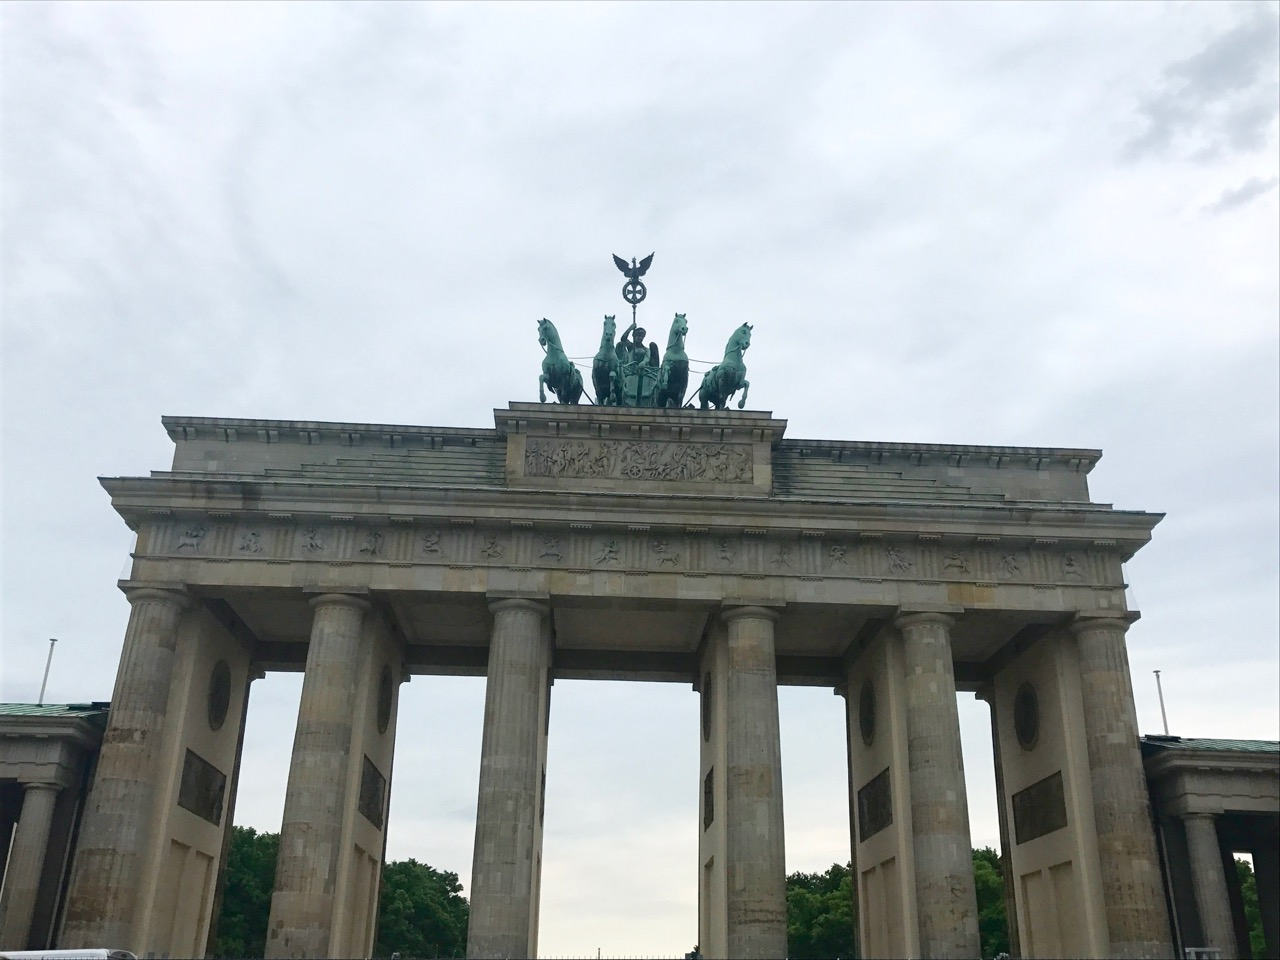 The Berlin Gate.